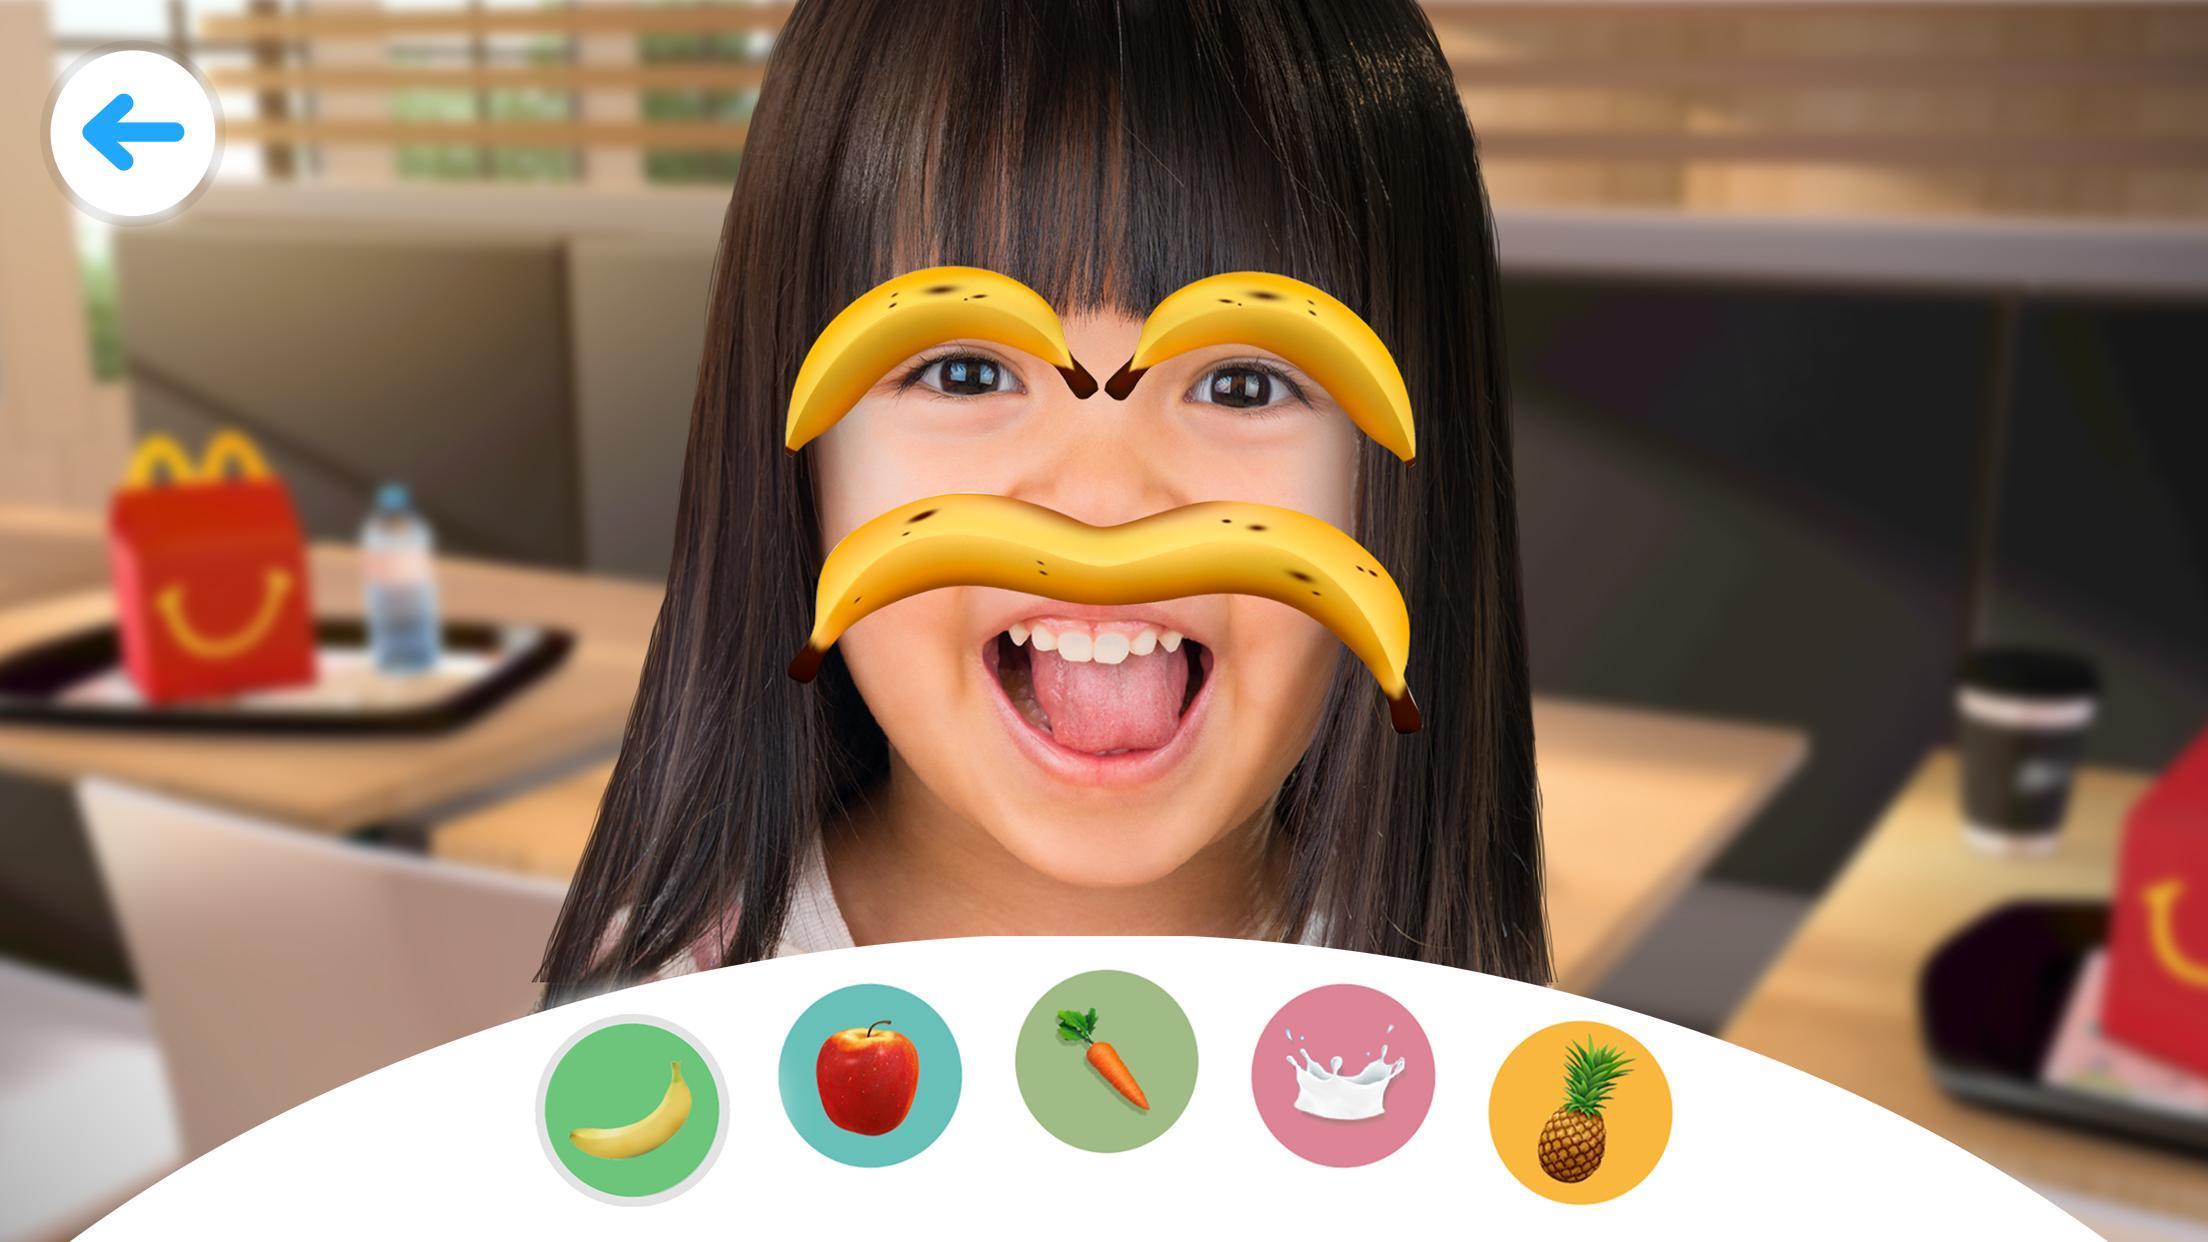 McDonald's Happy Meal App - MEA 9.5.0 Screenshot 3